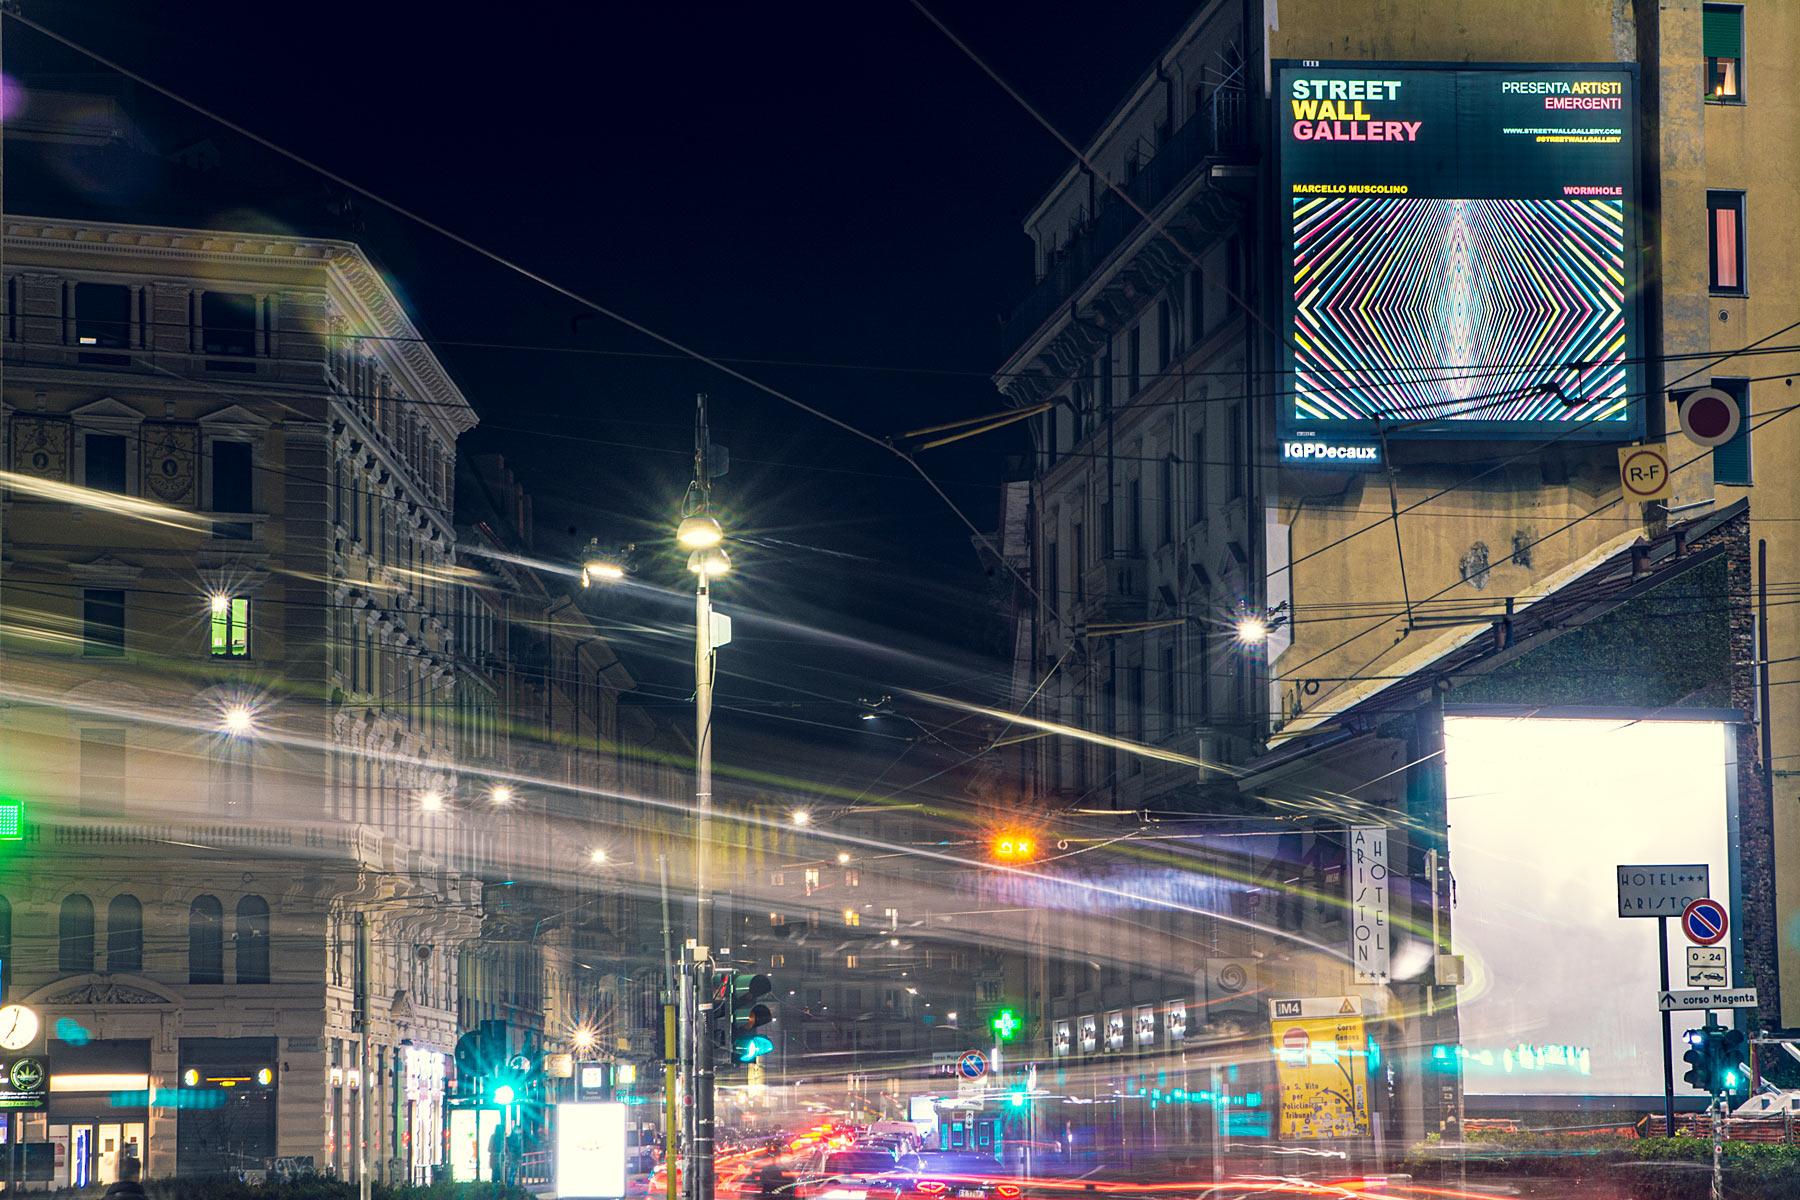 Street Wall Gallery - Via-Torino